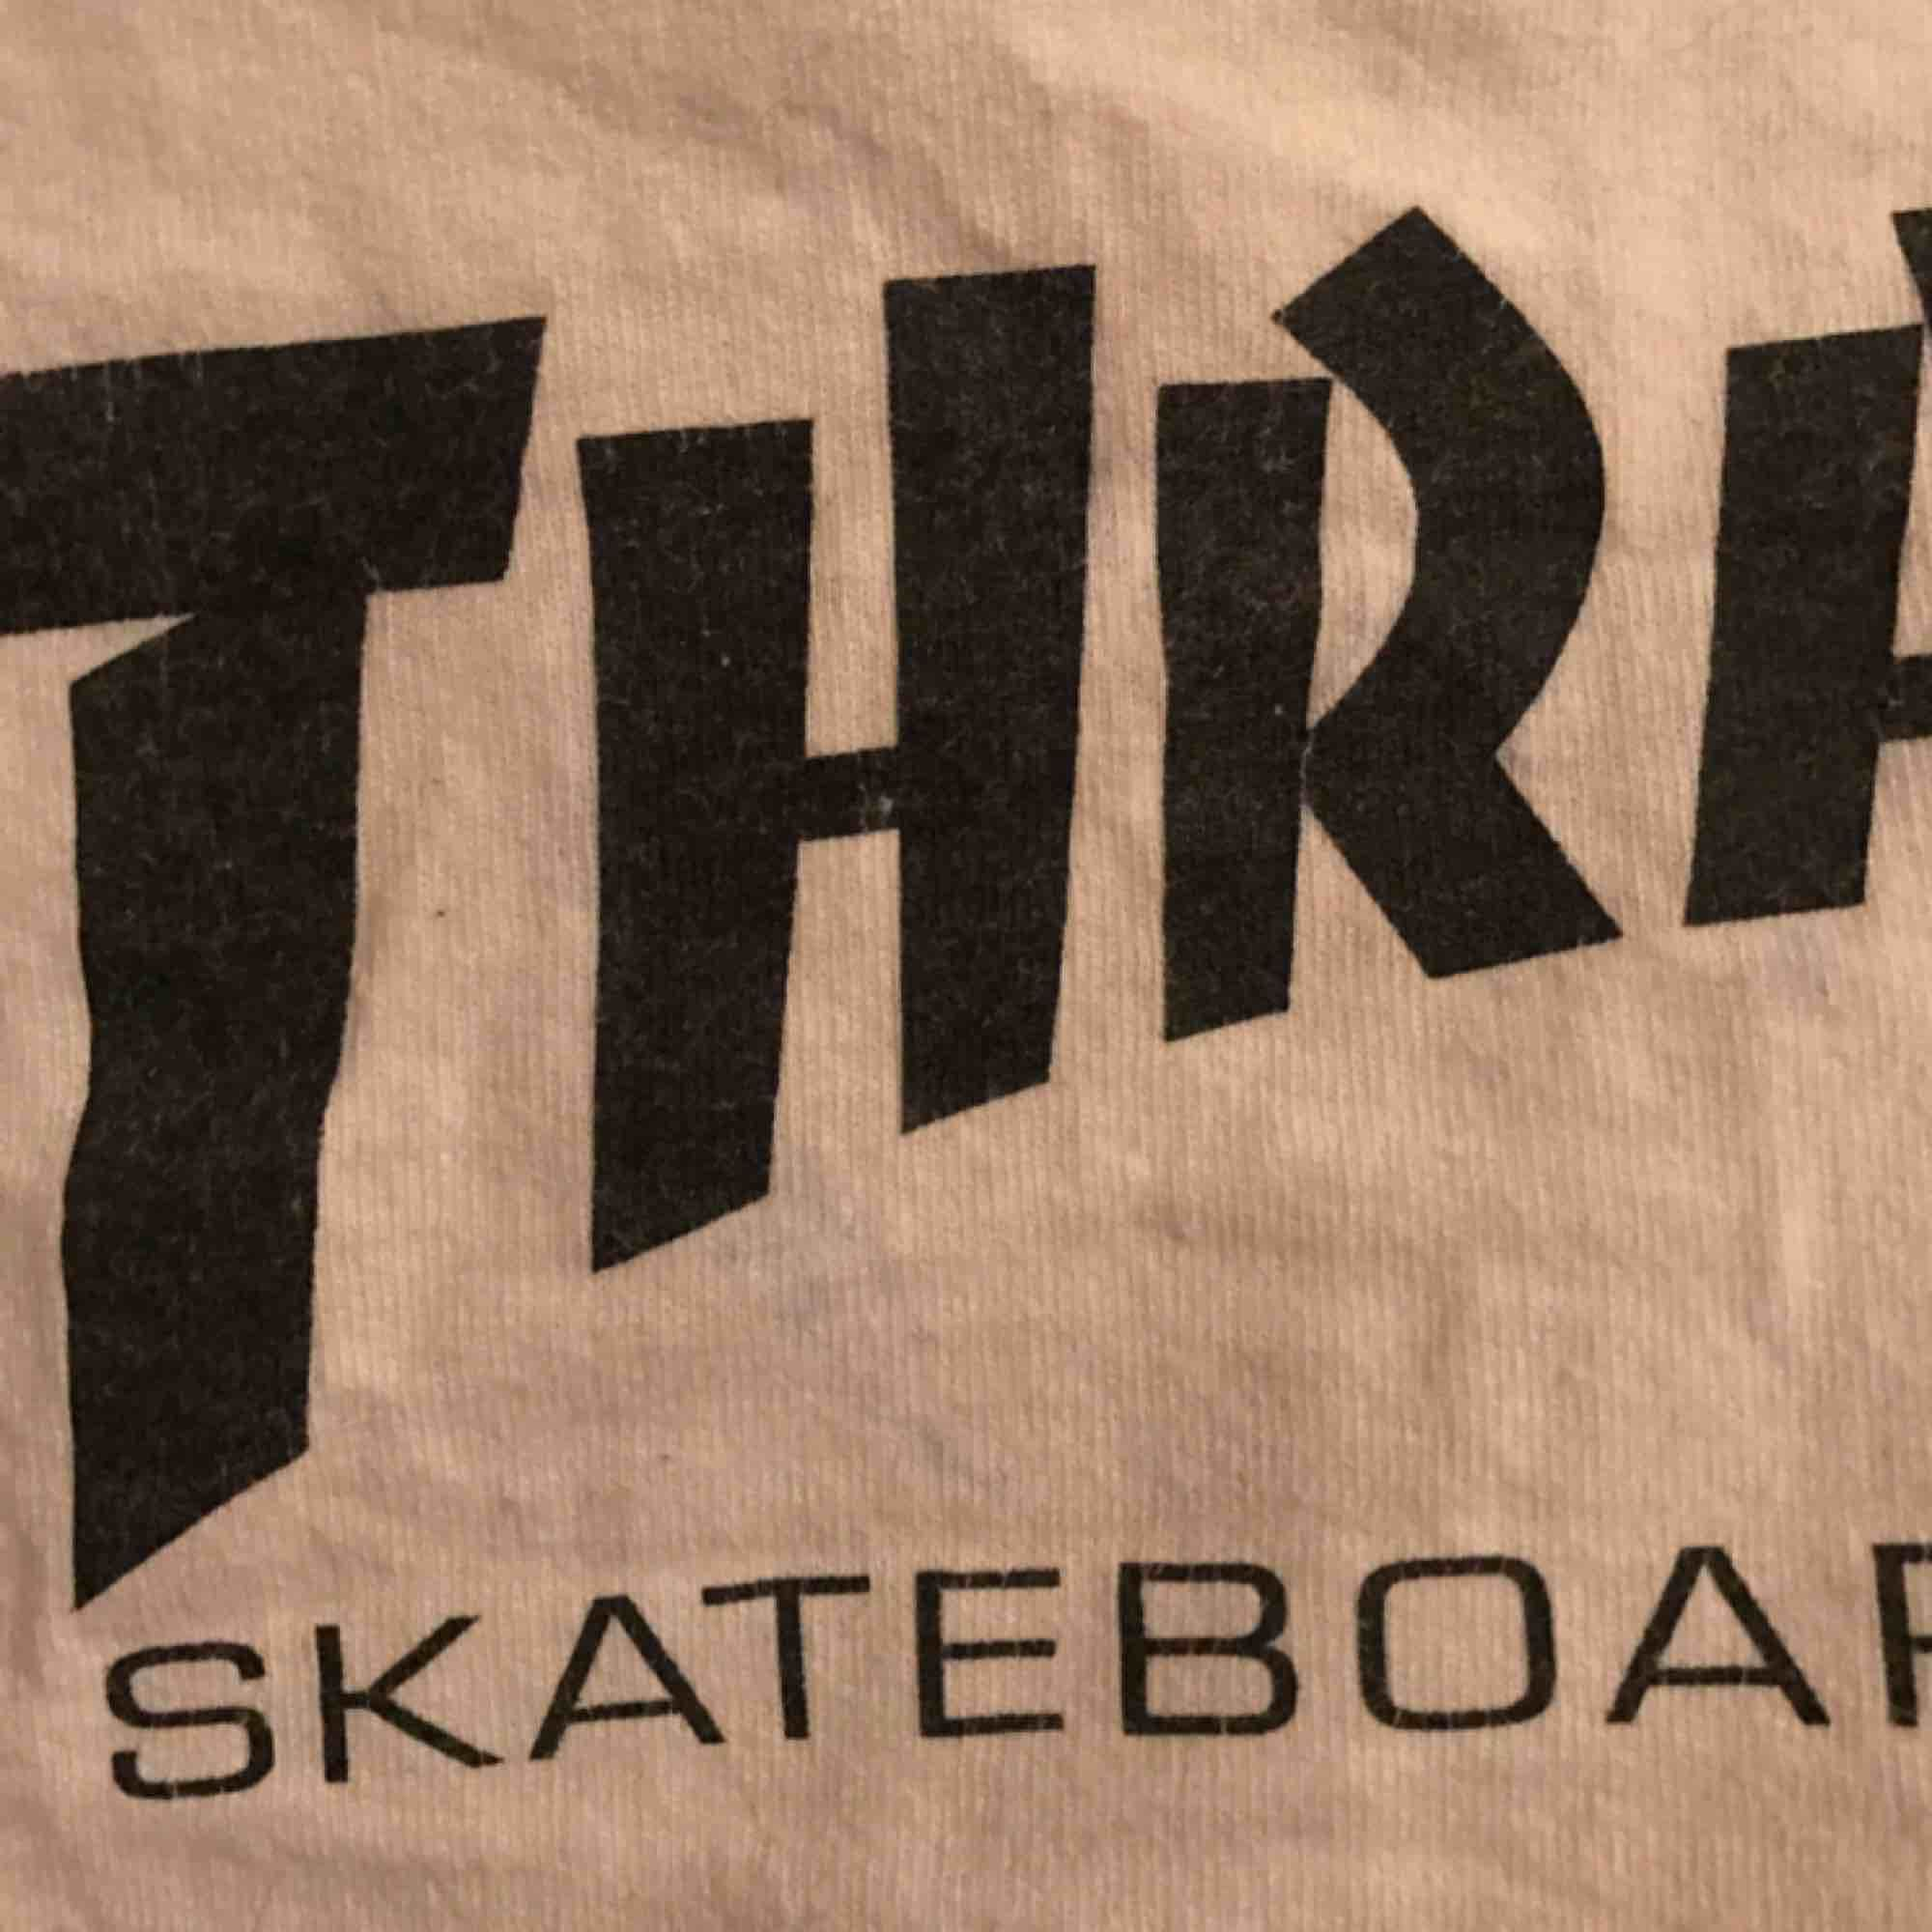 Avklippt Thrasher t-shirt till crop top, kort, storlek M frakt ingår. T-shirts.